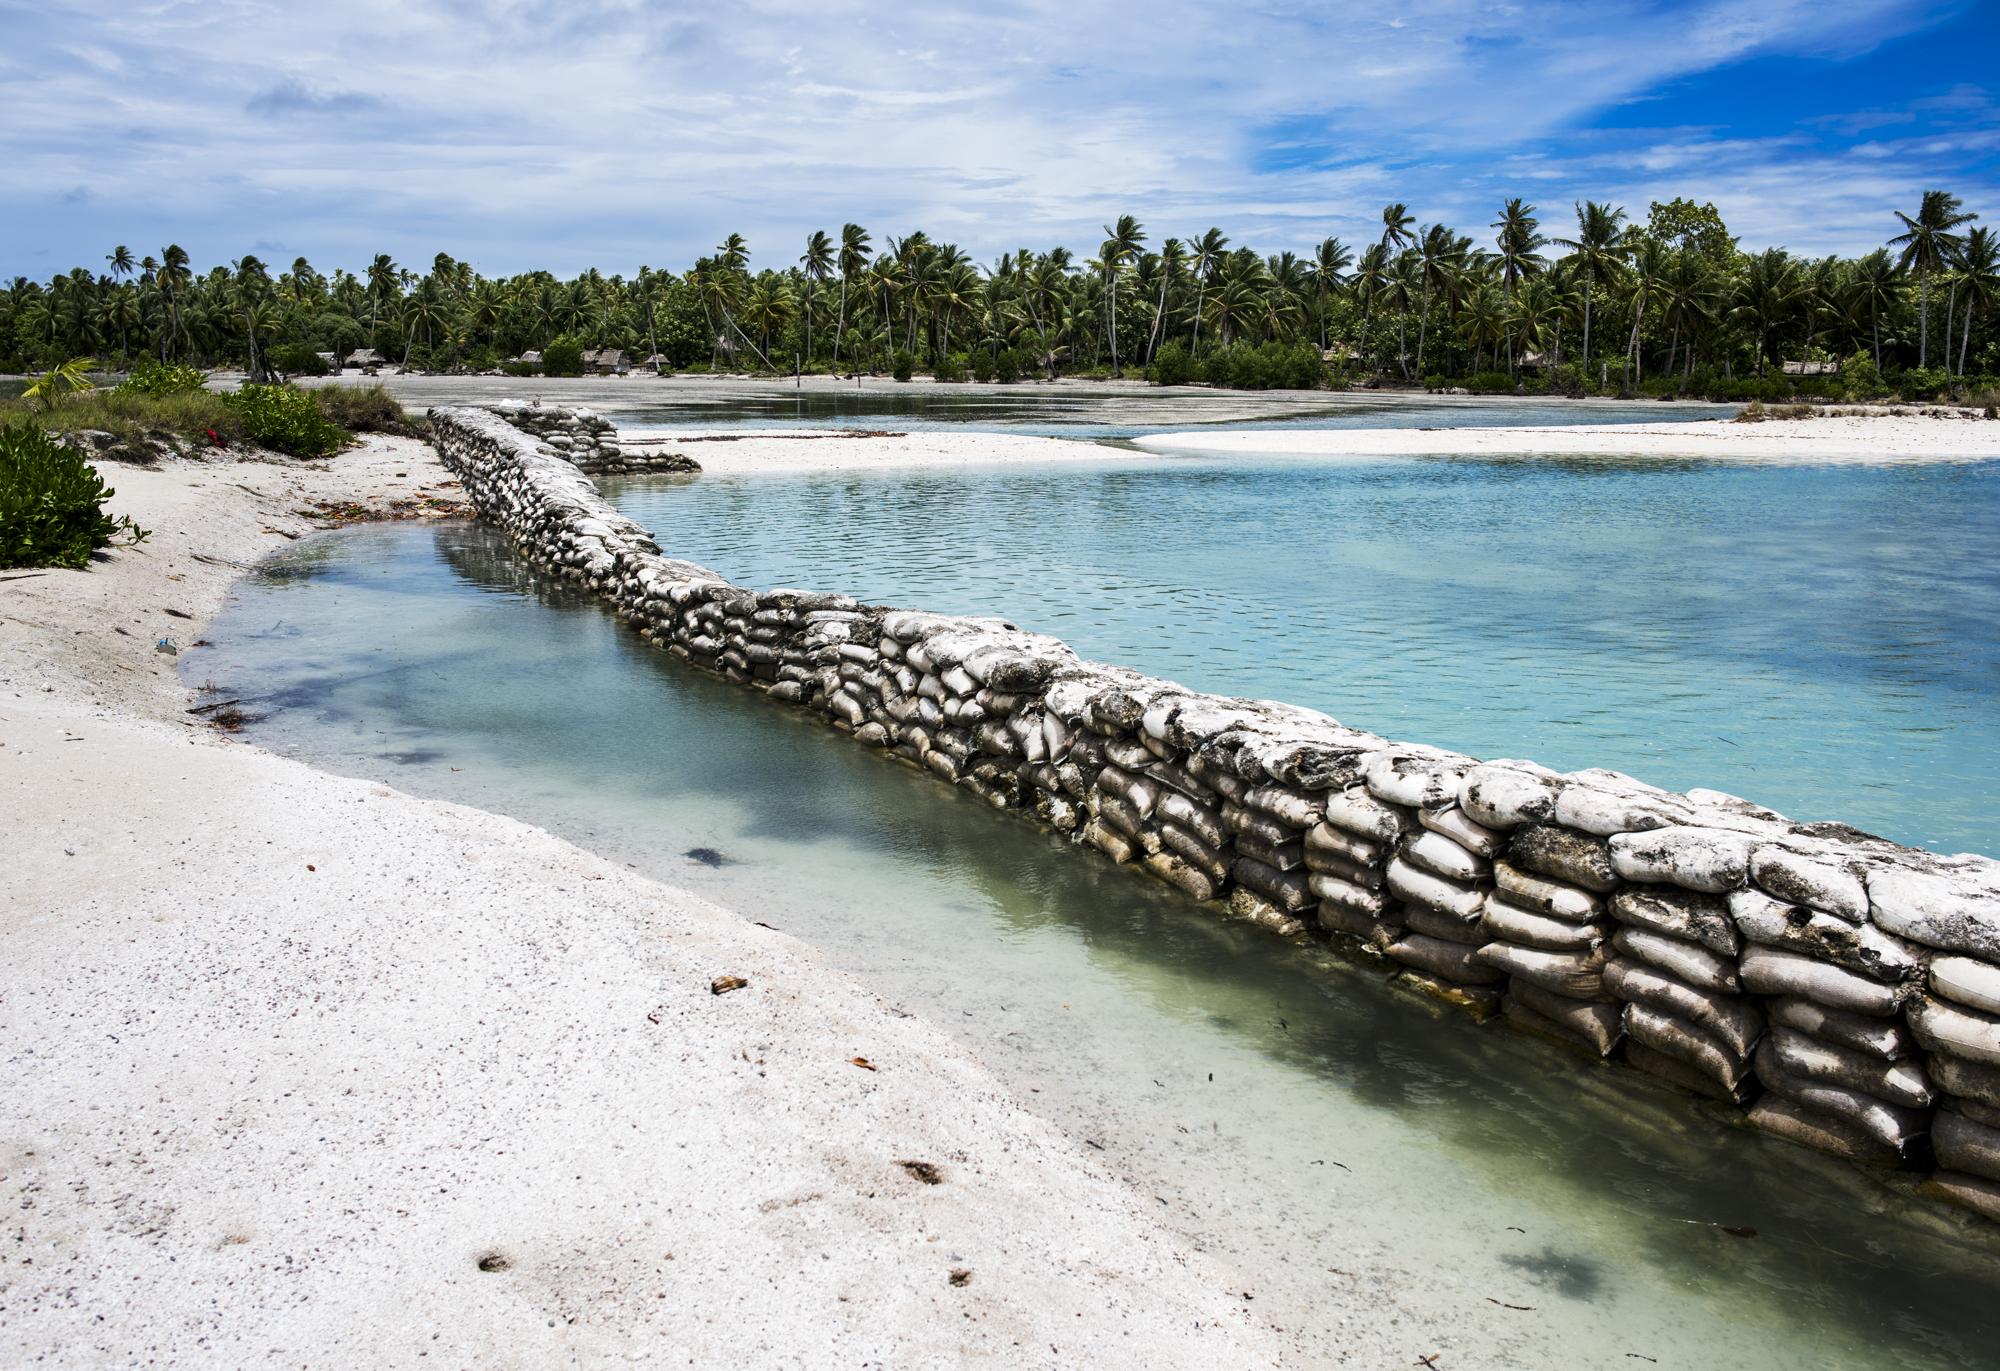 Kiribati_varslerne-32.jpg